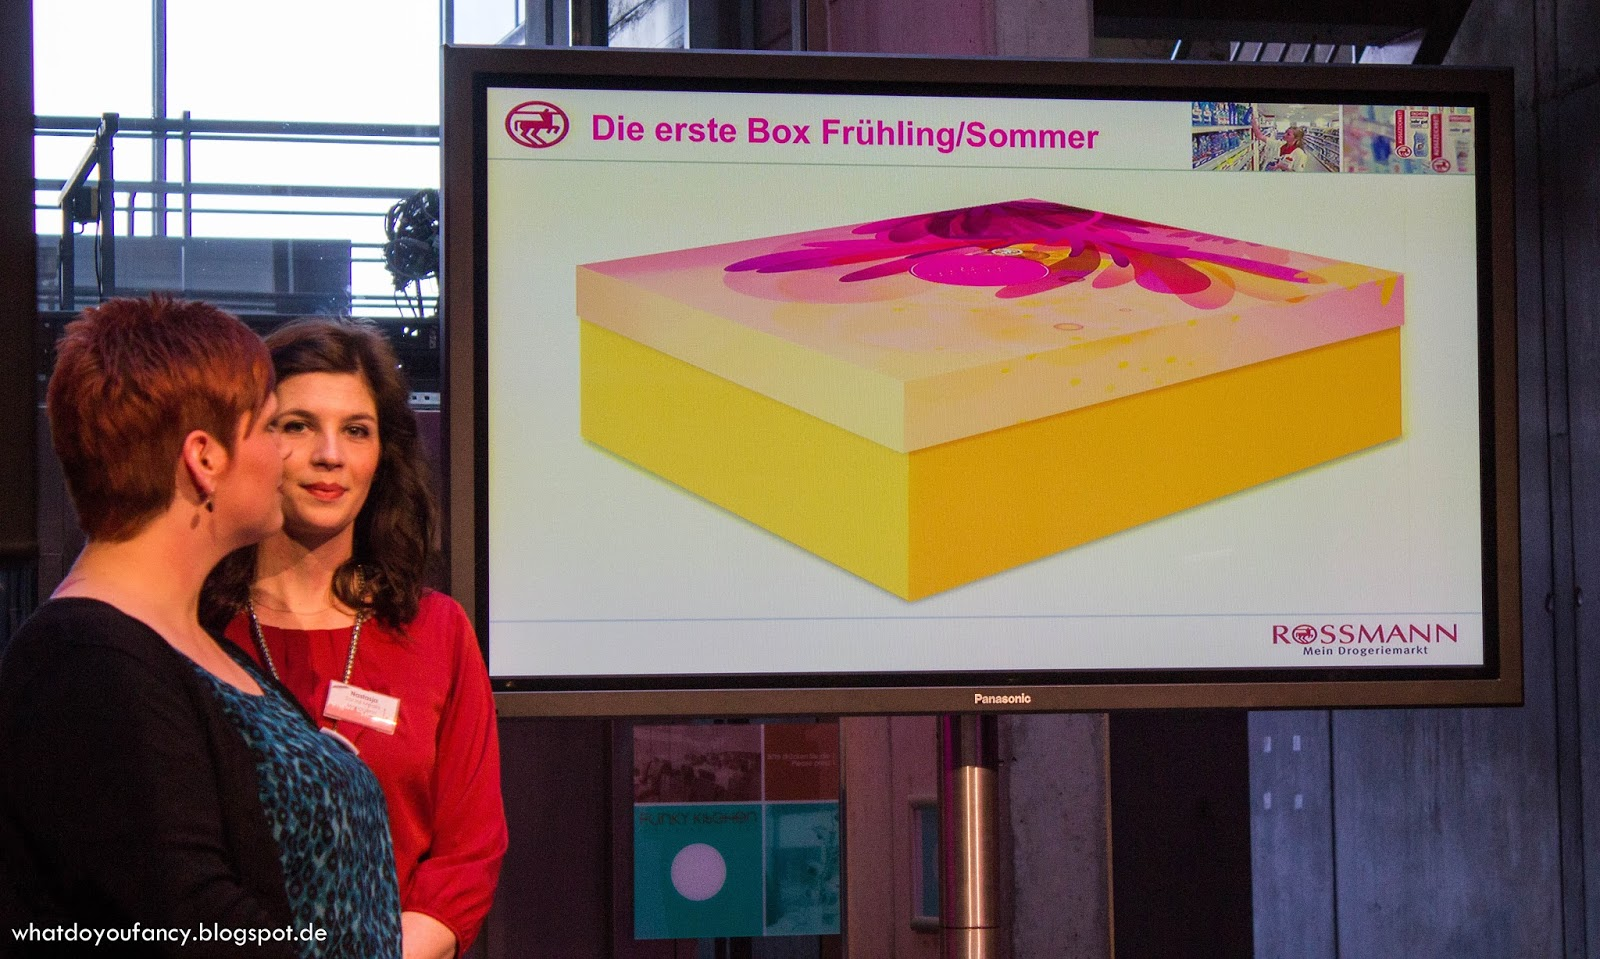 Rossmann Blogger-Event in Hannover März 2014